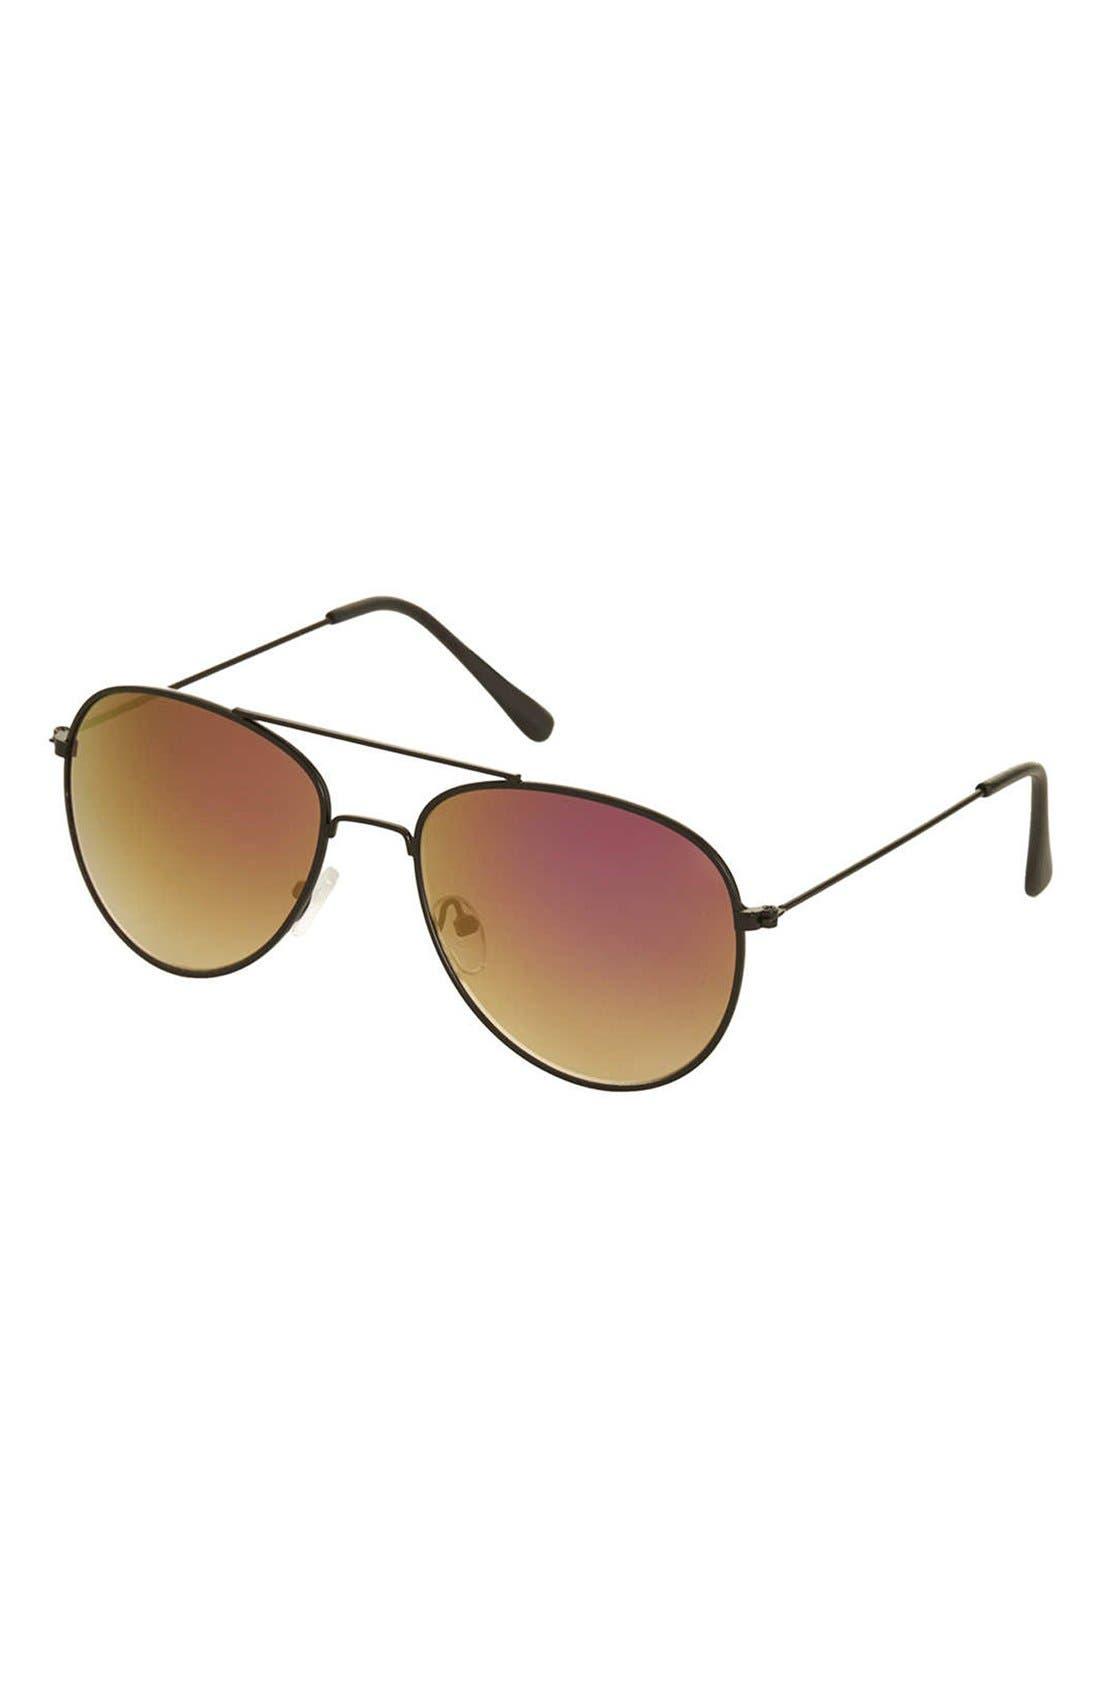 Alternate Image 1 Selected - Topshop 'Alice' Aviator Sunglasses